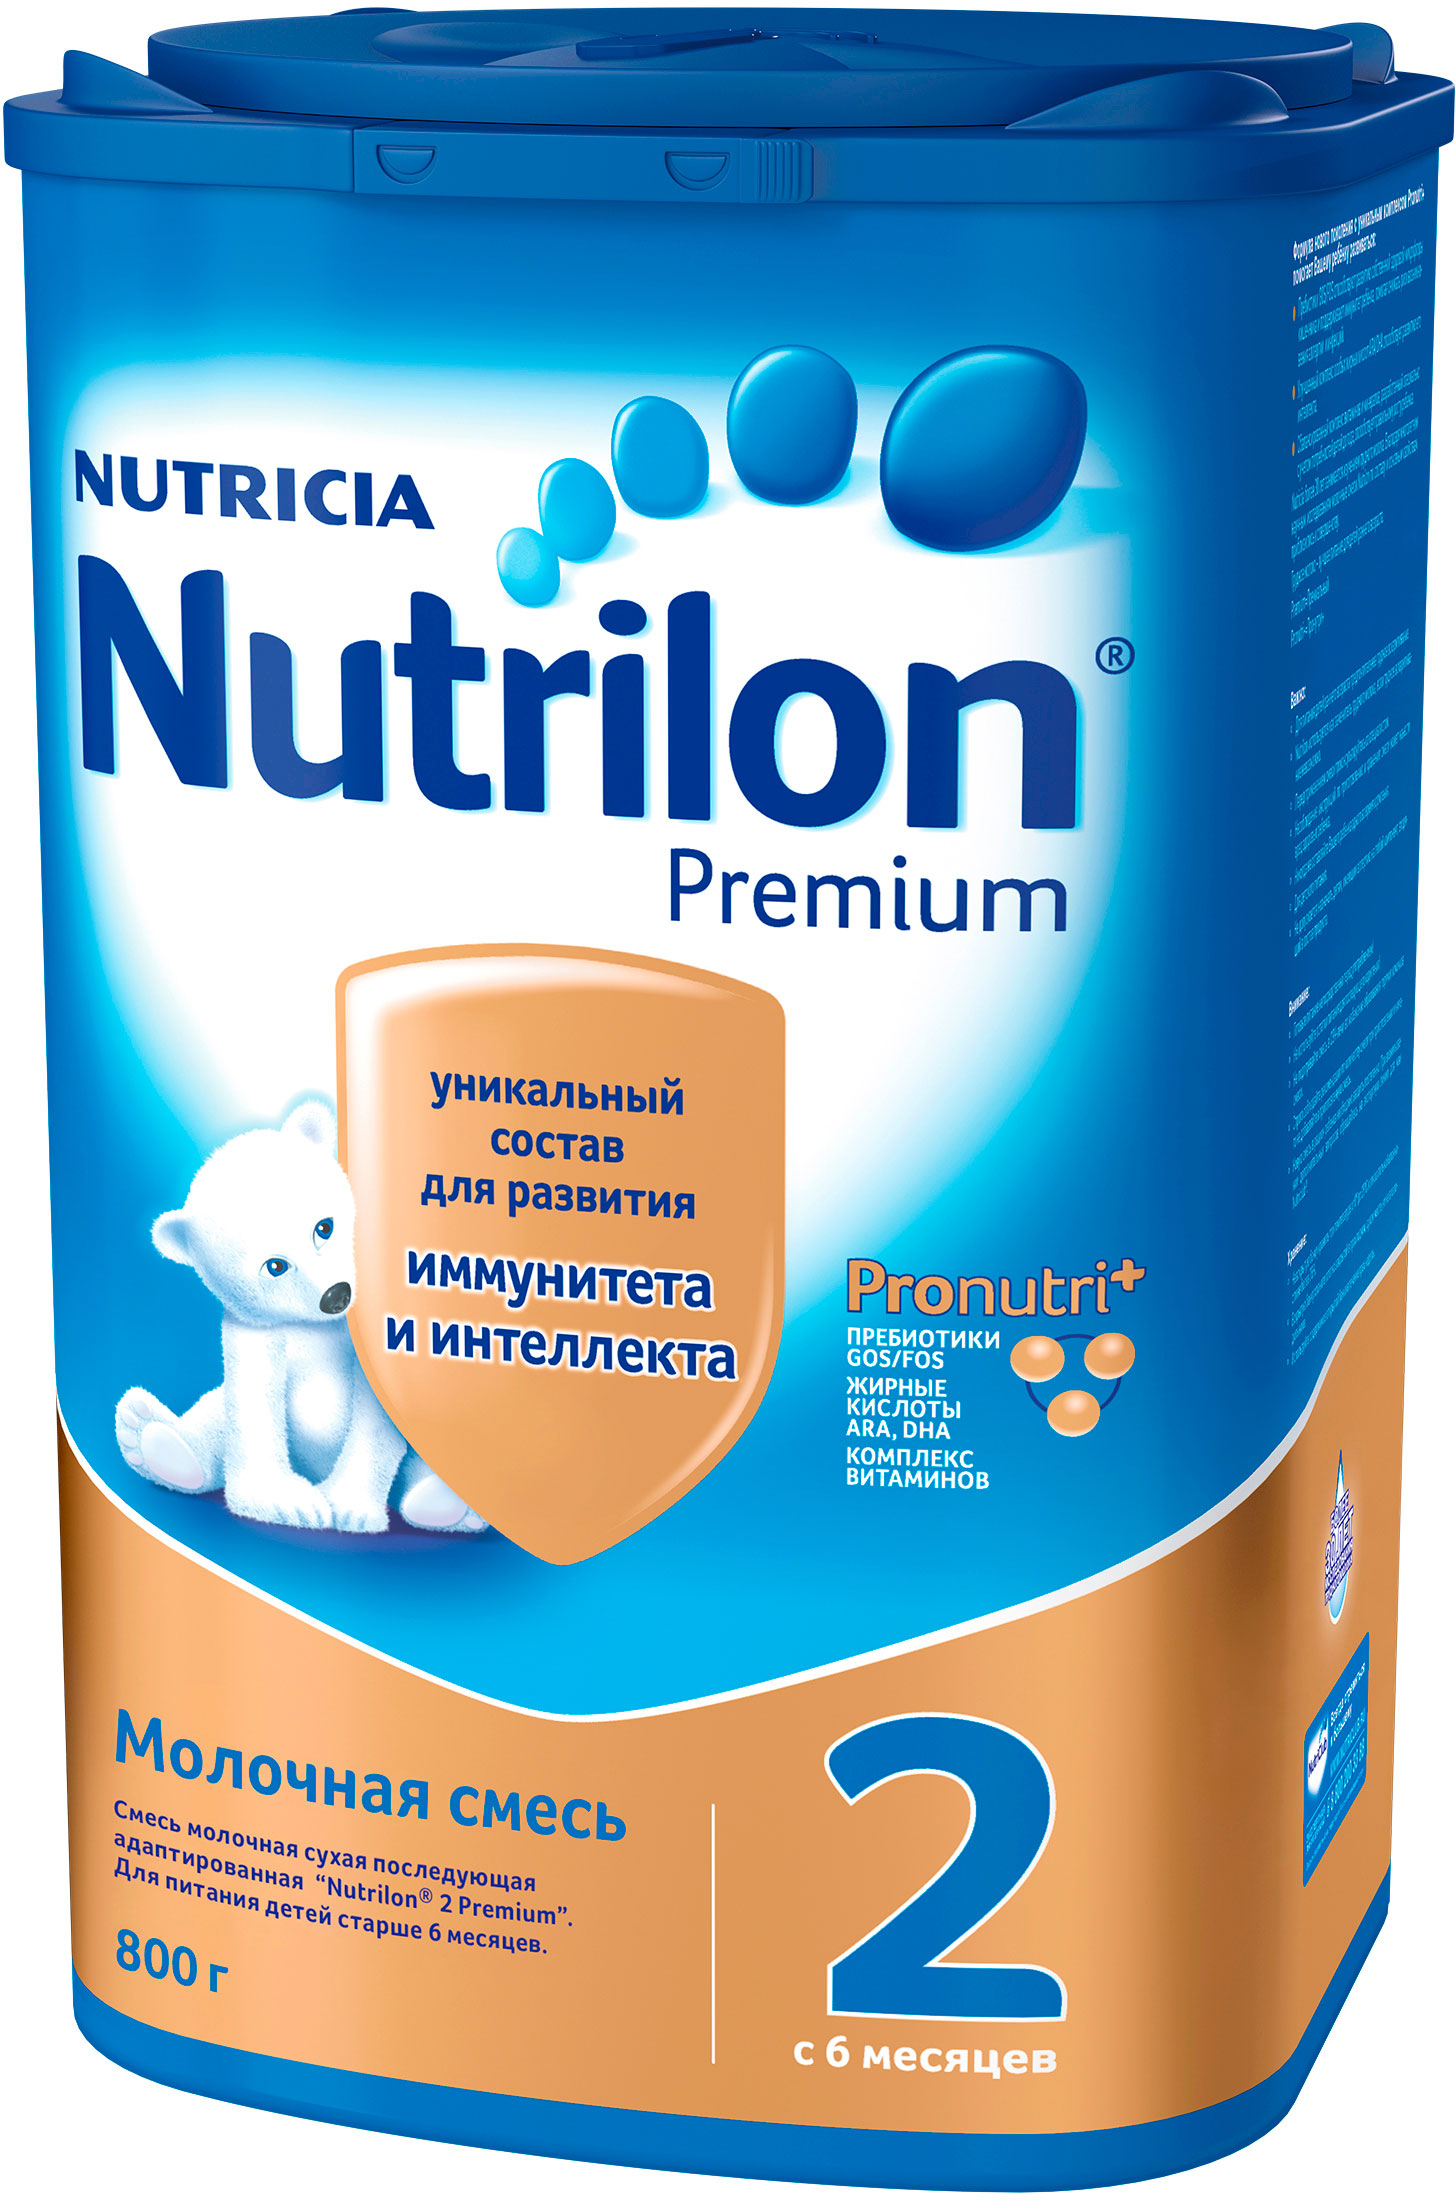 Сухие Nutrilon Nutrilon (Nutricia) 2 Premium (c 6 месяцев) 800 г nutrilon 2 молочная смесь premium с 6 мес 800 г